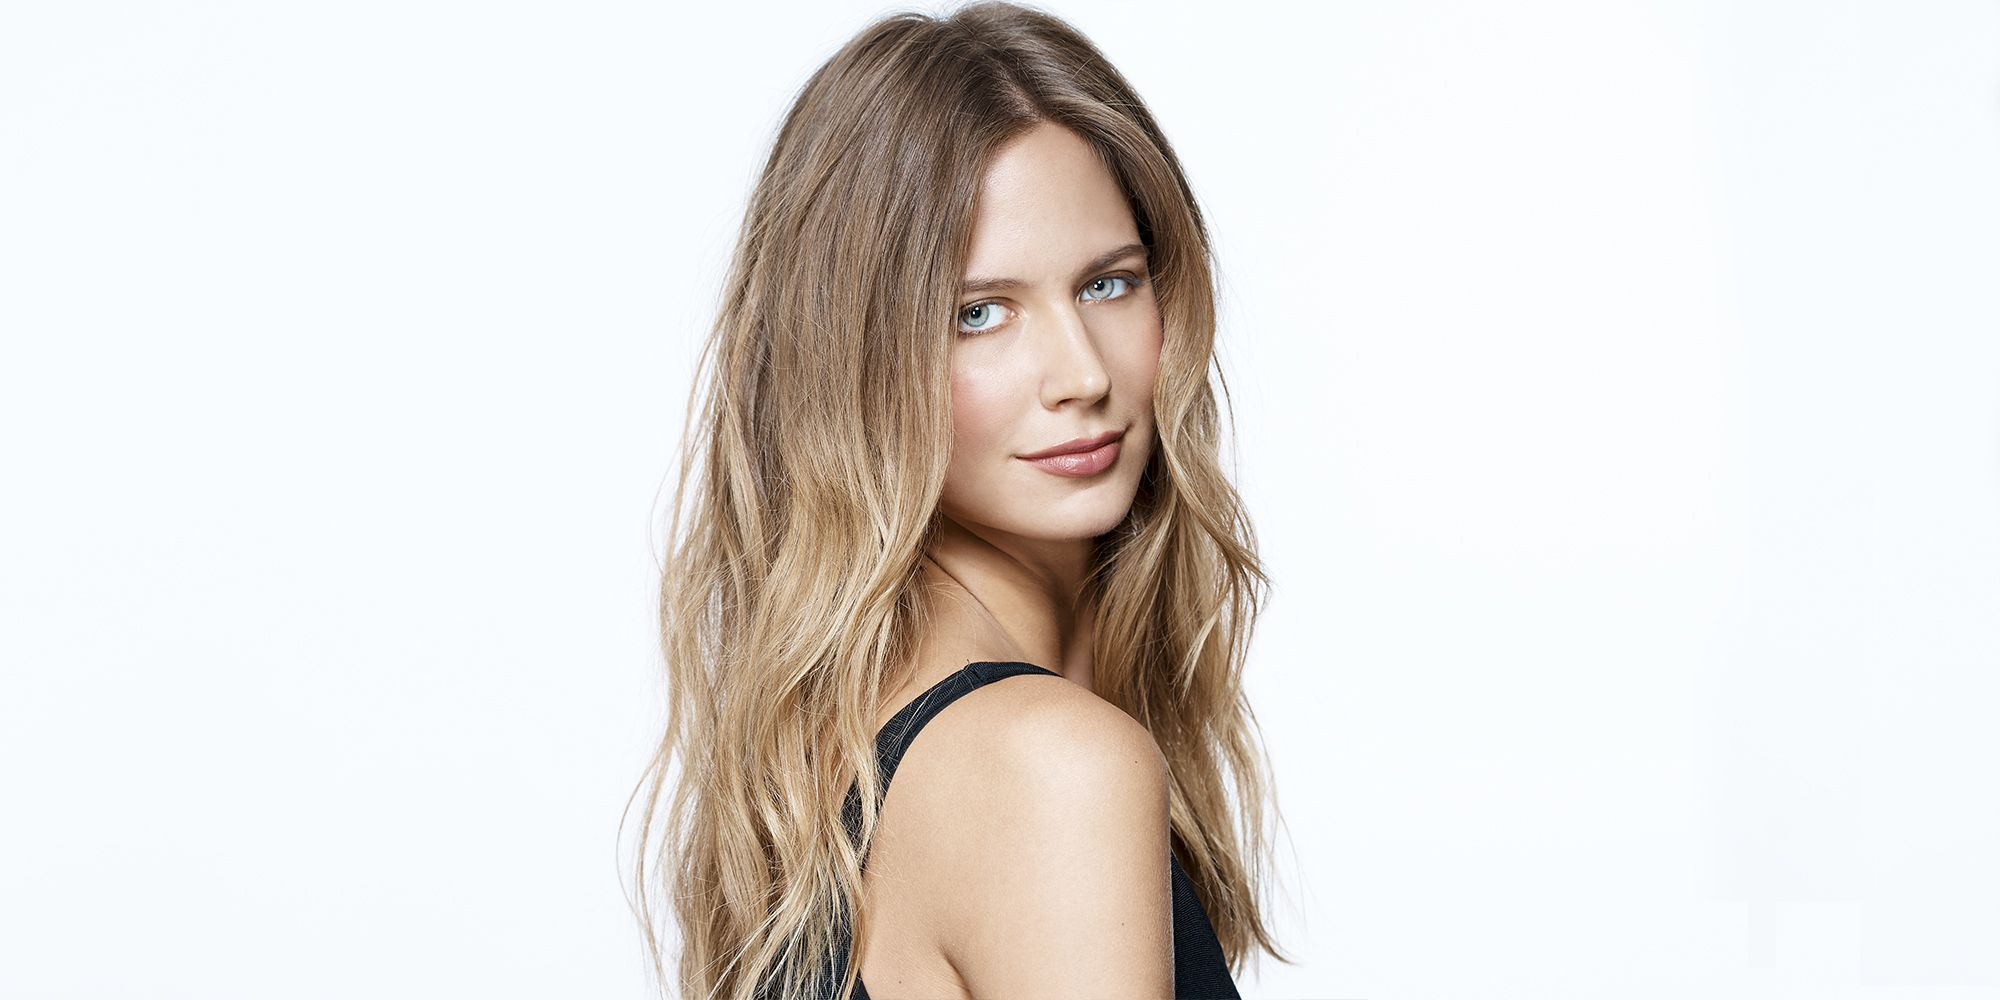 How to Get Wavy Hair - 6-Step Bohemian Waves Hair Tutorial